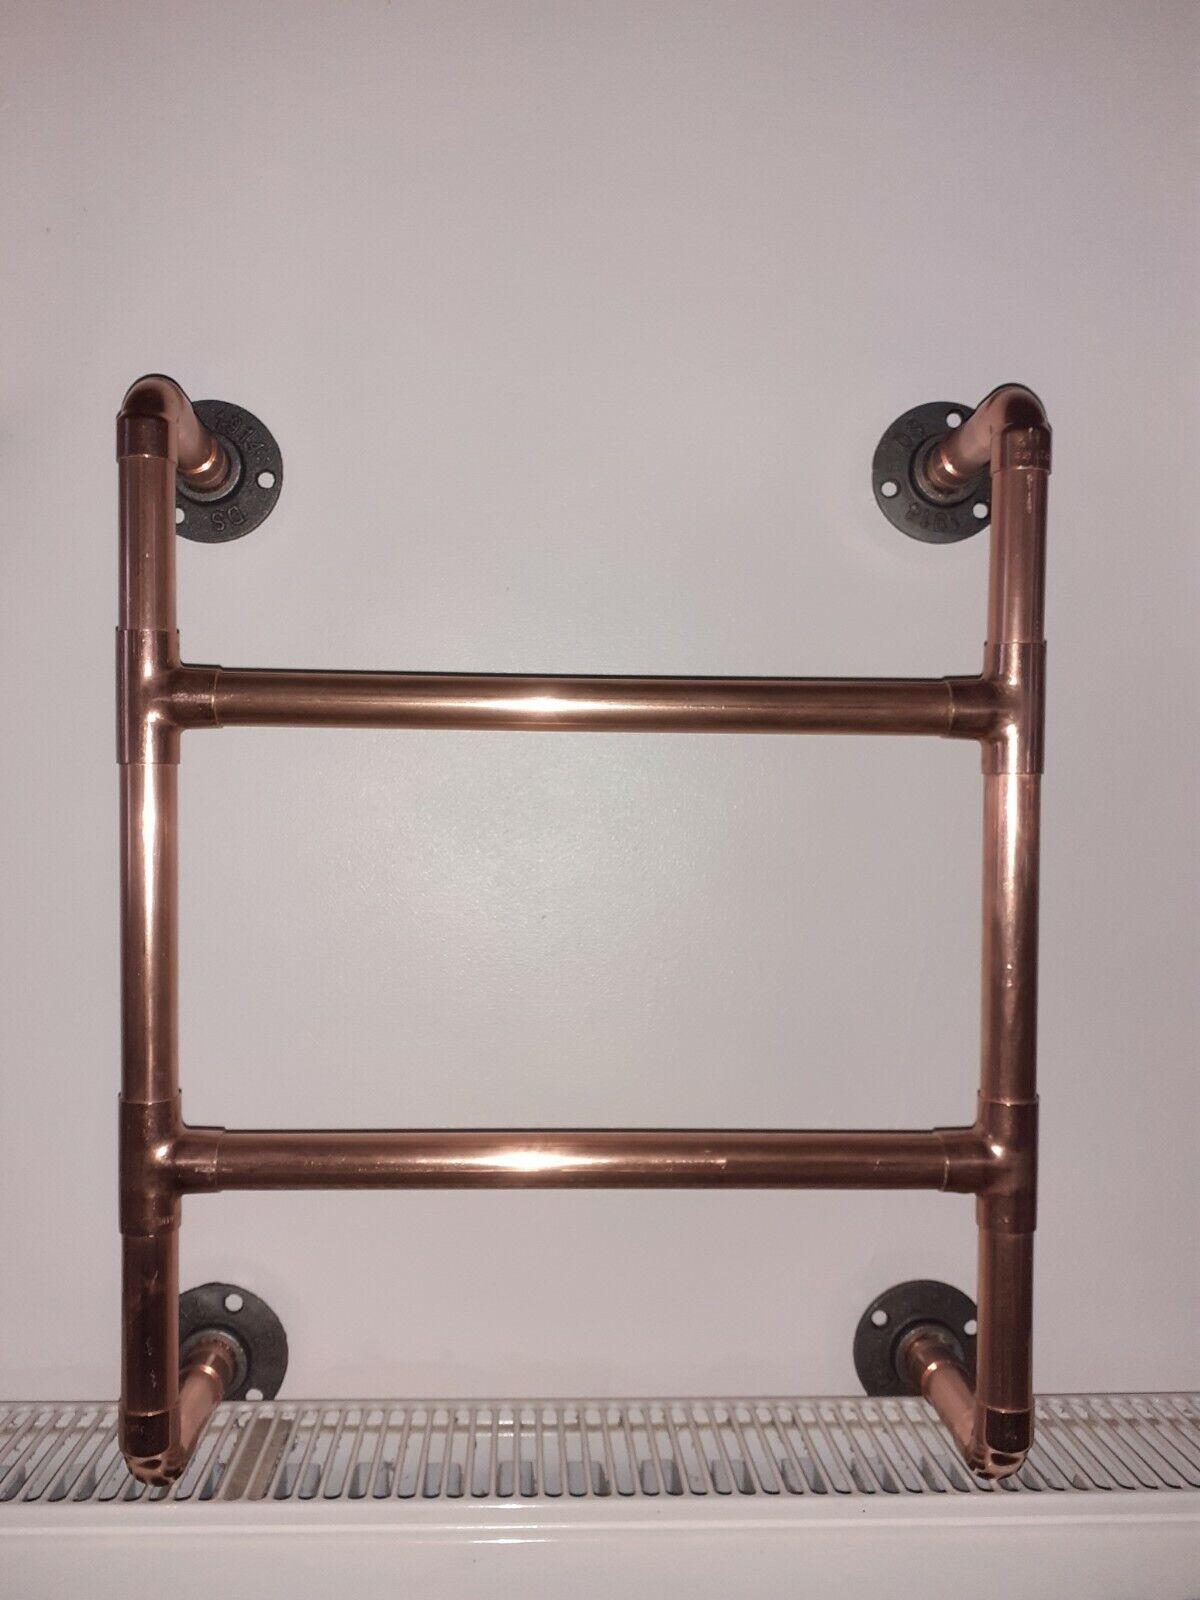 Copper pipe towel rail